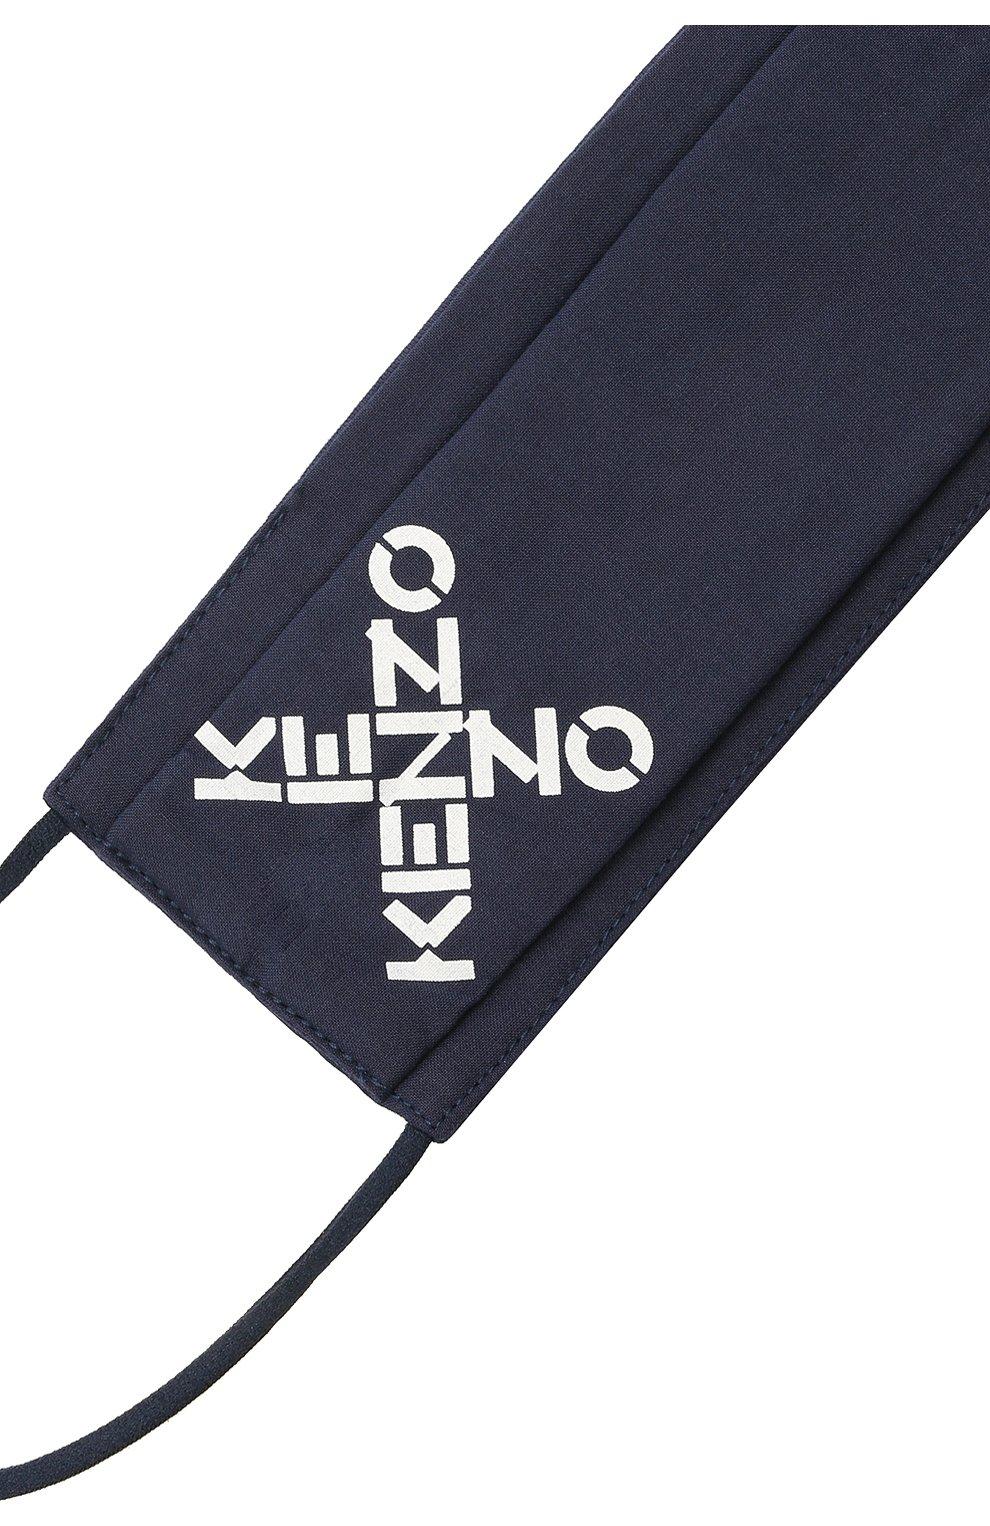 Мужская набор из трех масок для лица kenzo sport KENZO разноцветного цвета, арт. FA68MK221SCB | Фото 5 (Материал: Текстиль; Мужское Кросс-КТ: Маска)